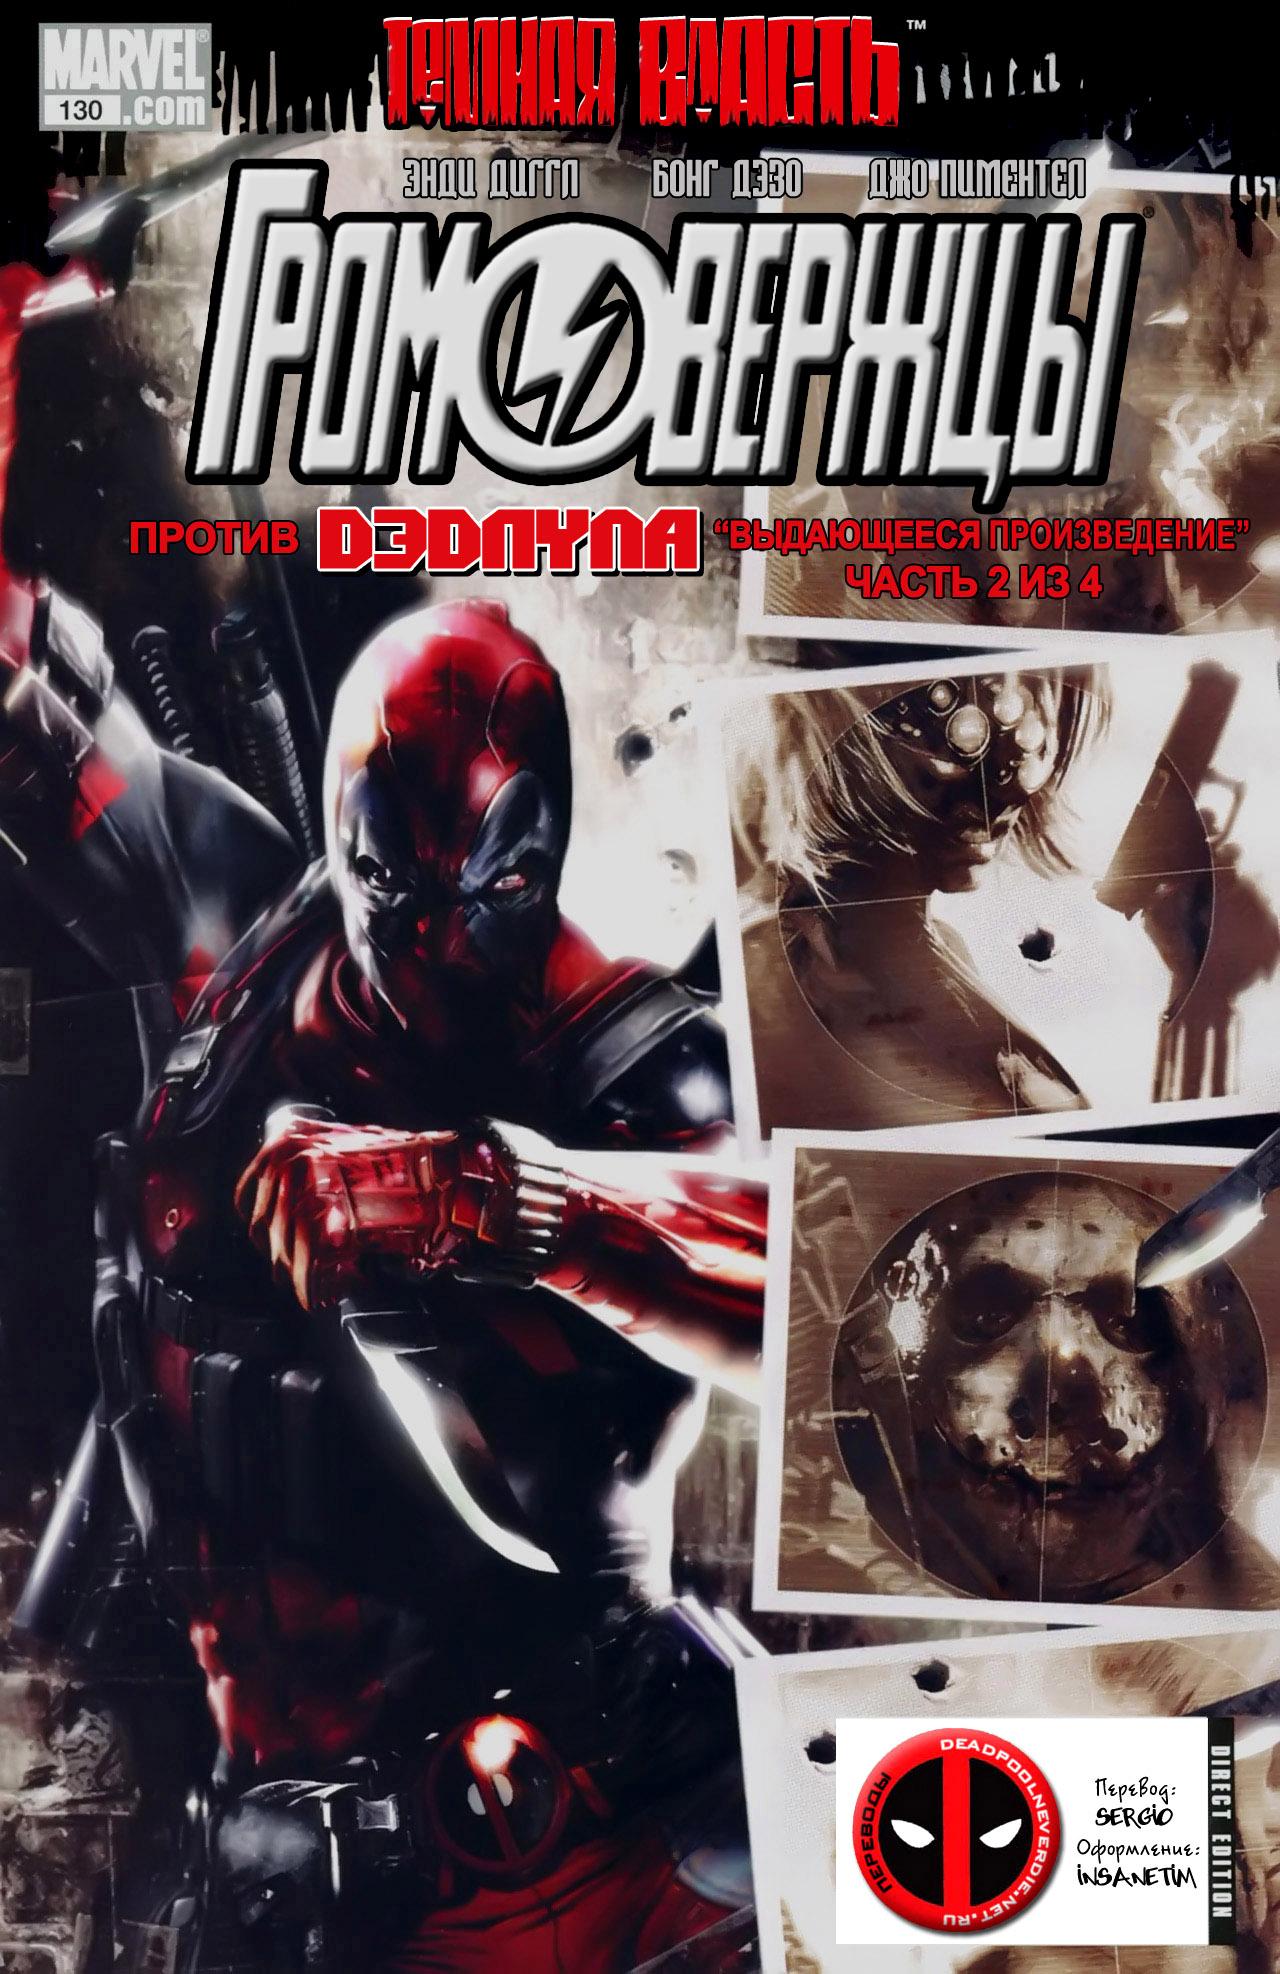 Комиксы для взрослых - Громовержцы - # 130 - Страница №1 - Thunderbolts - # 130 Dead to Rights